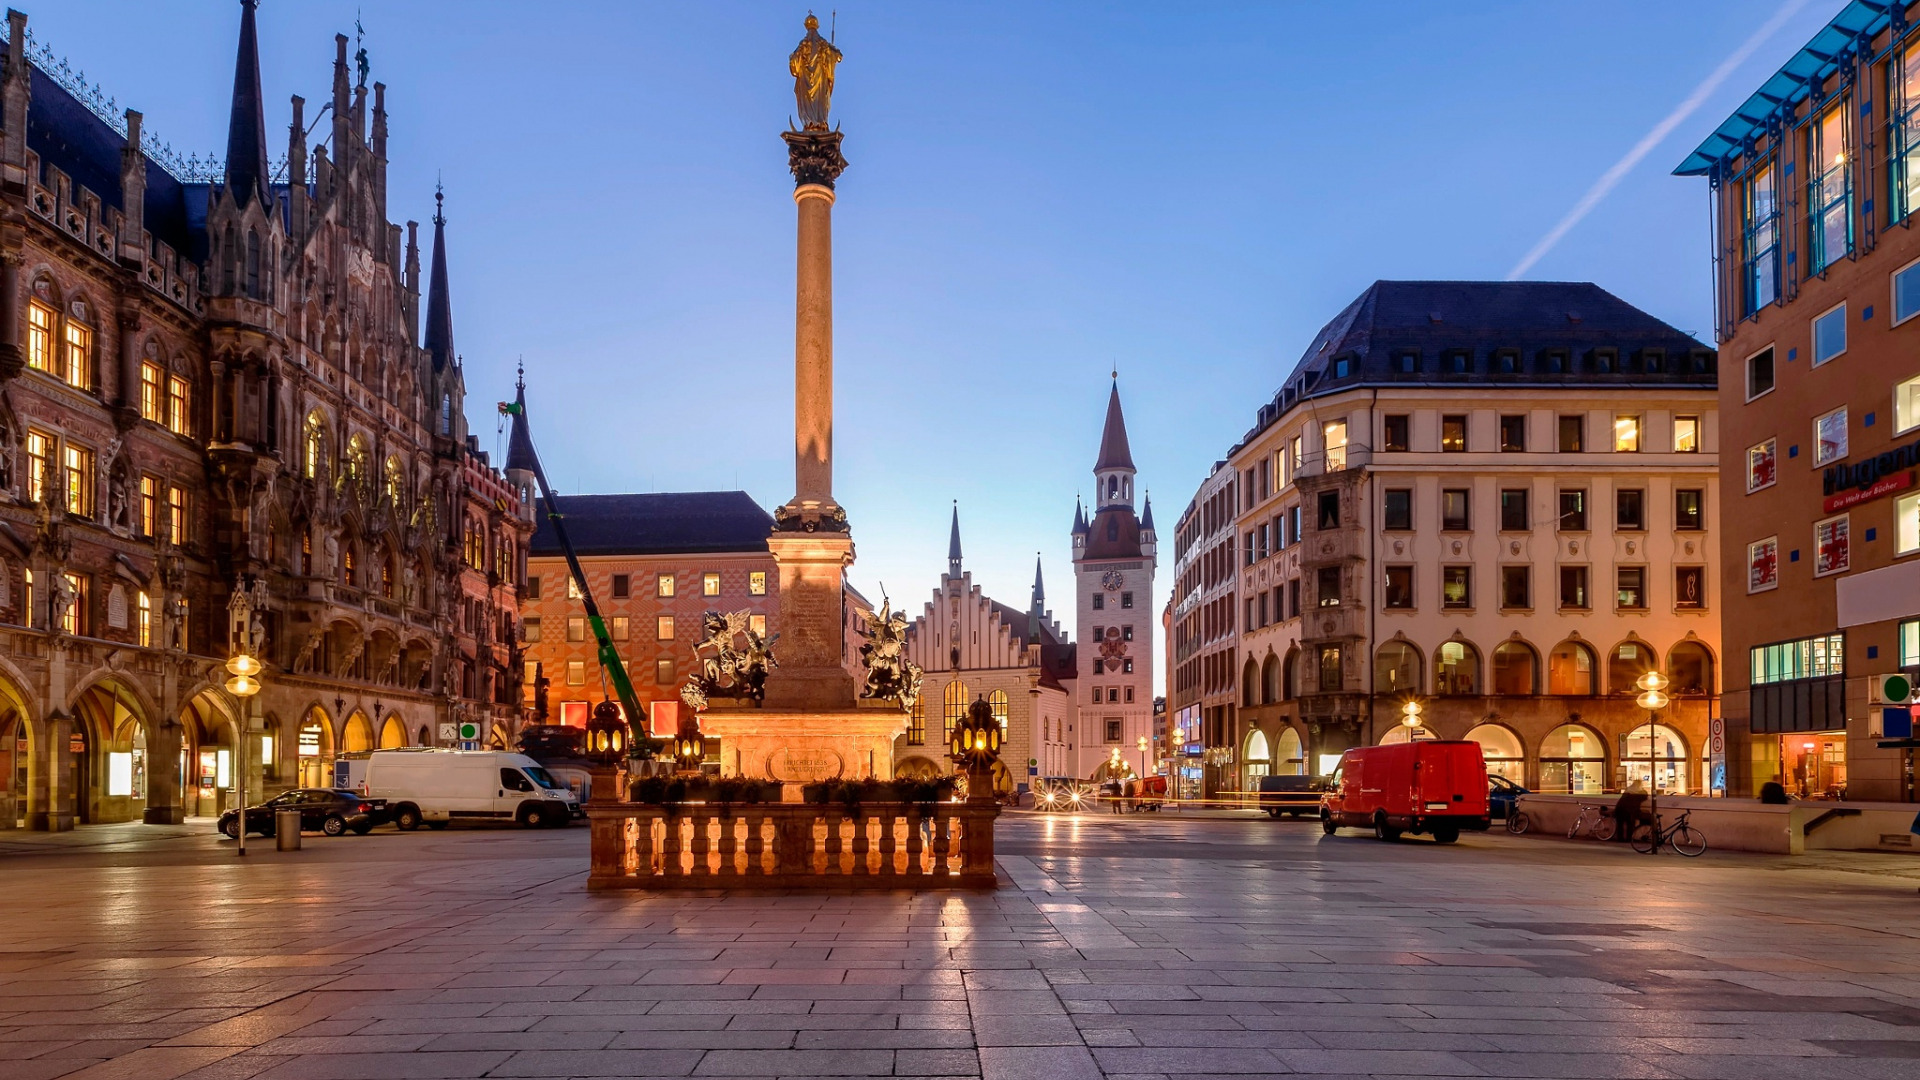 мюнхен площадь мариенплац фото так давно